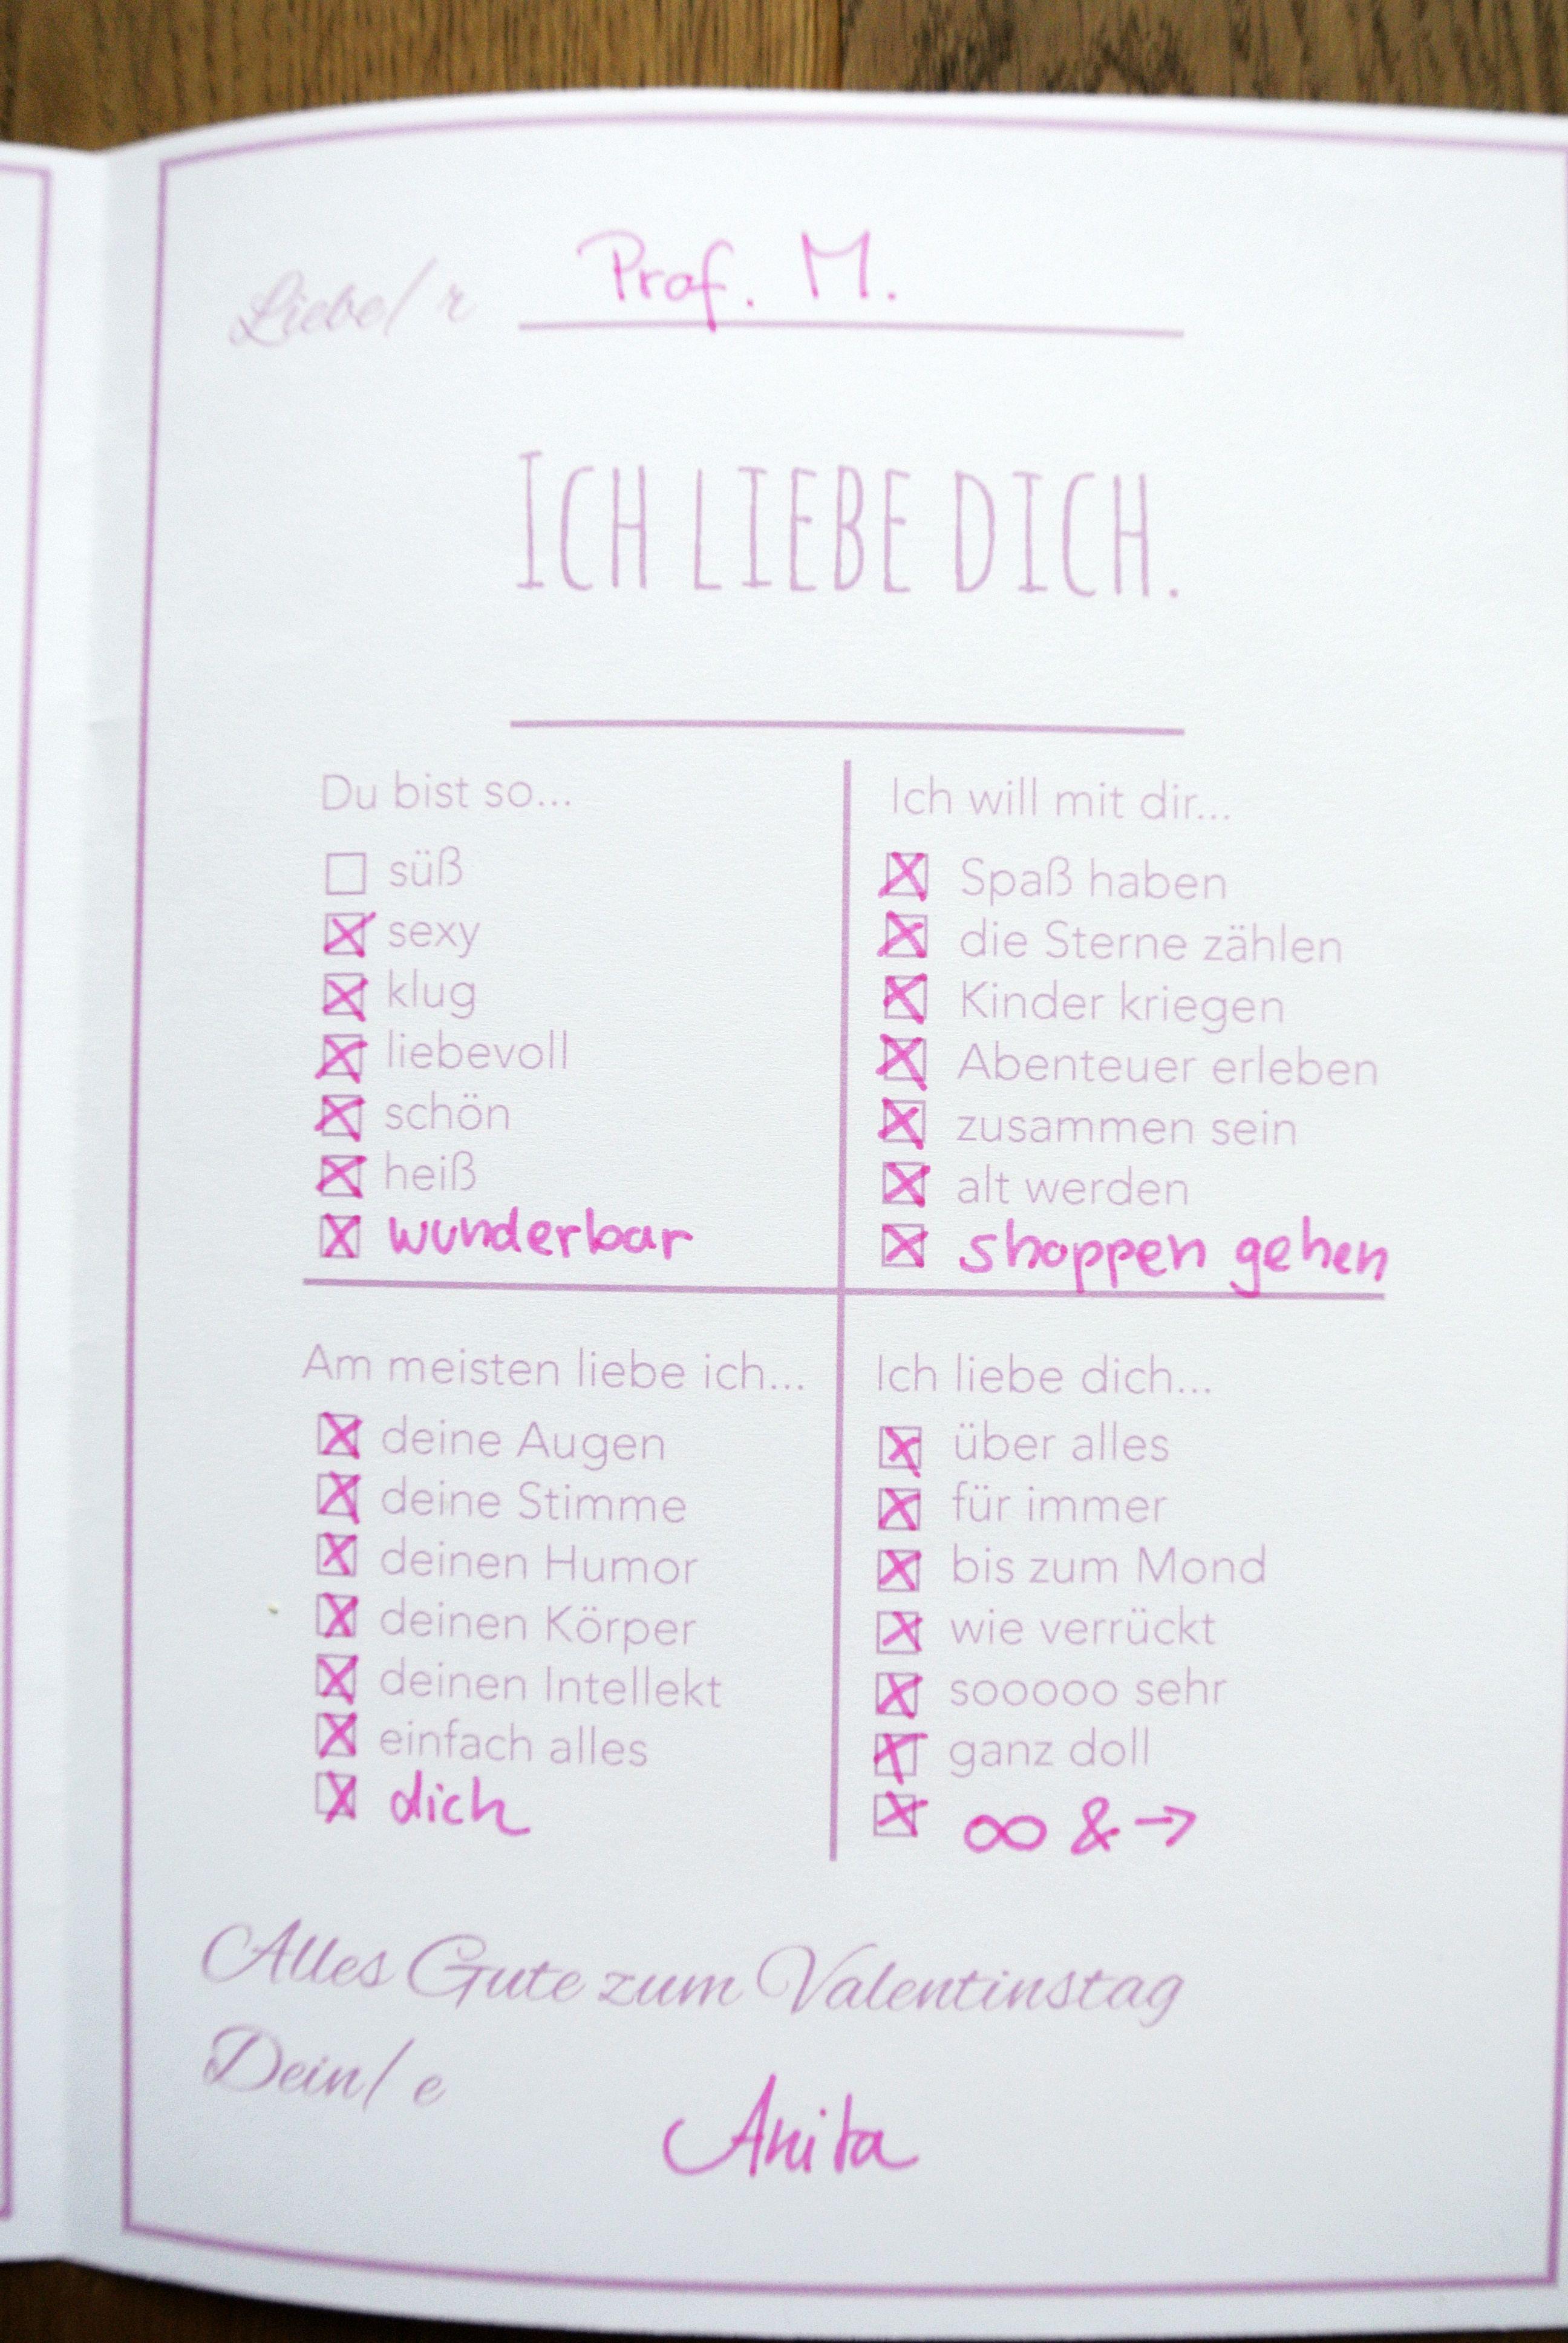 Liebesbrief-free-Printable-innen.jpg 2.592×3.872 Pixel